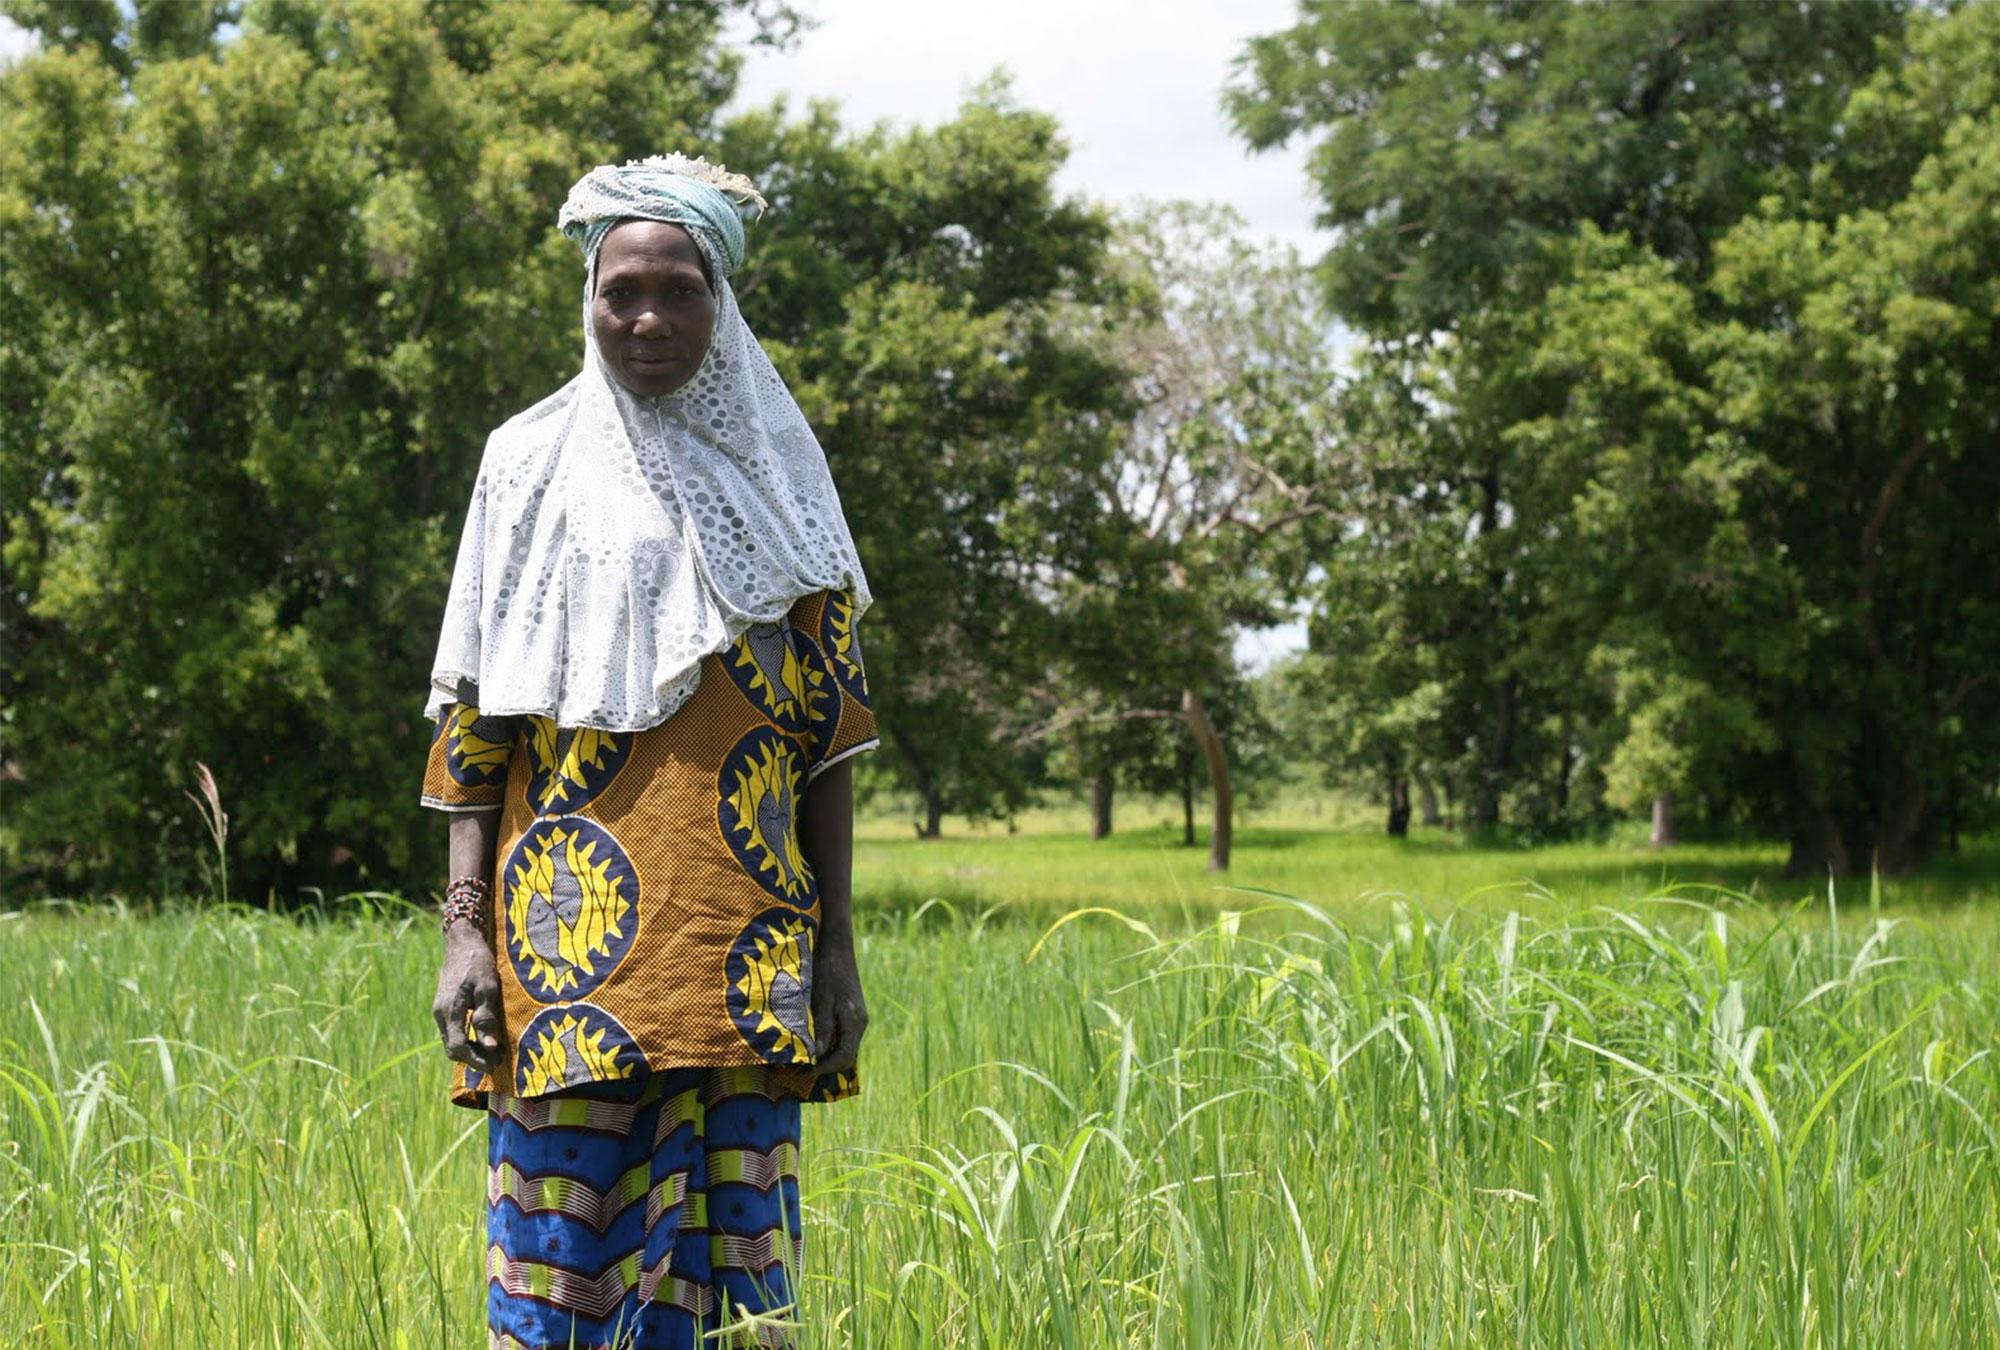 A farmer in Mali